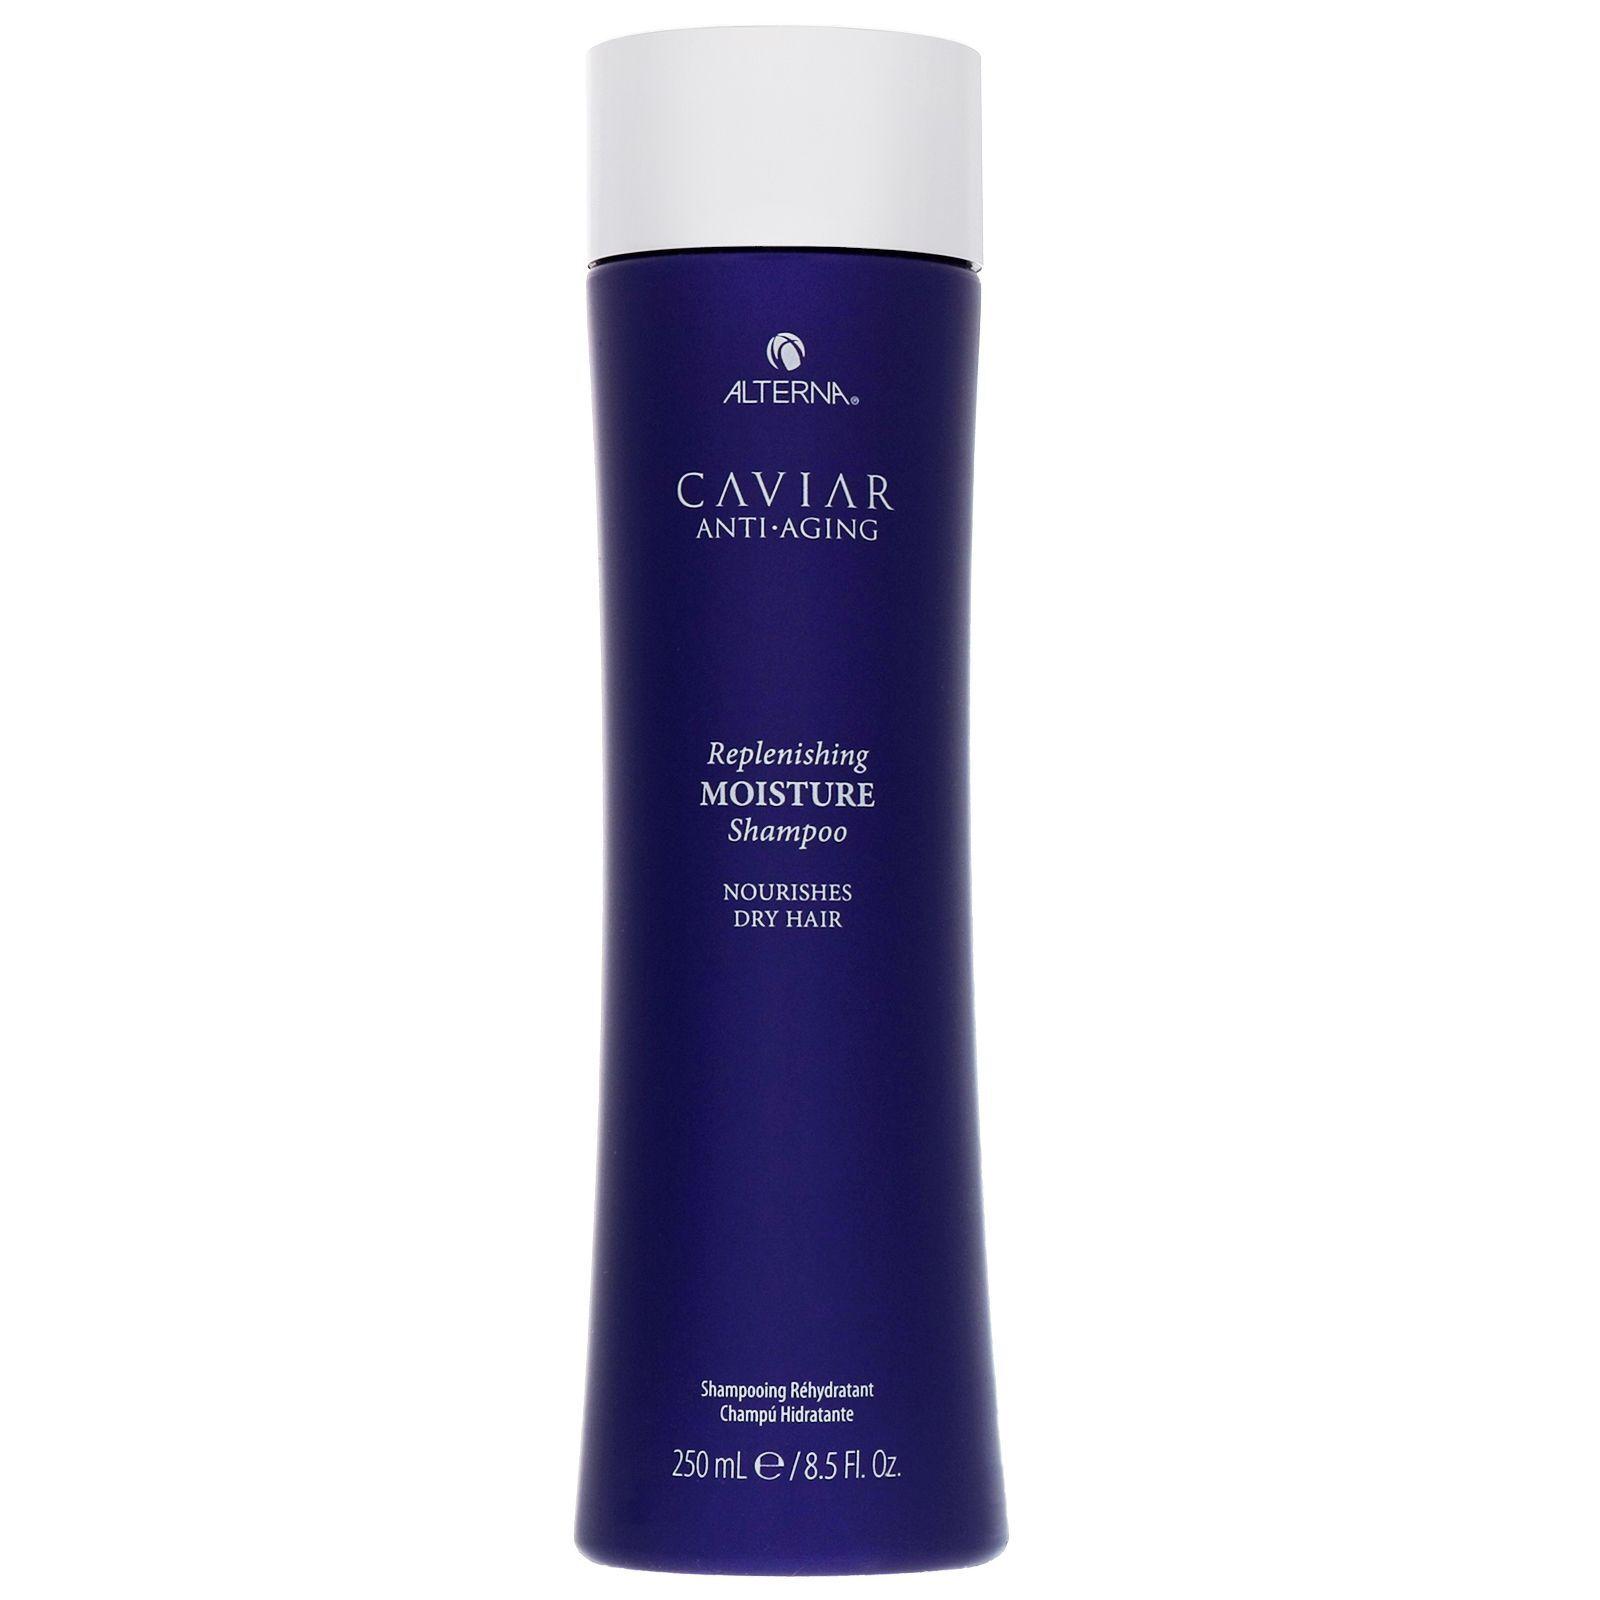 Alterna Caviar Anti-Aging Reintegro Moisture Shampoo 250ml